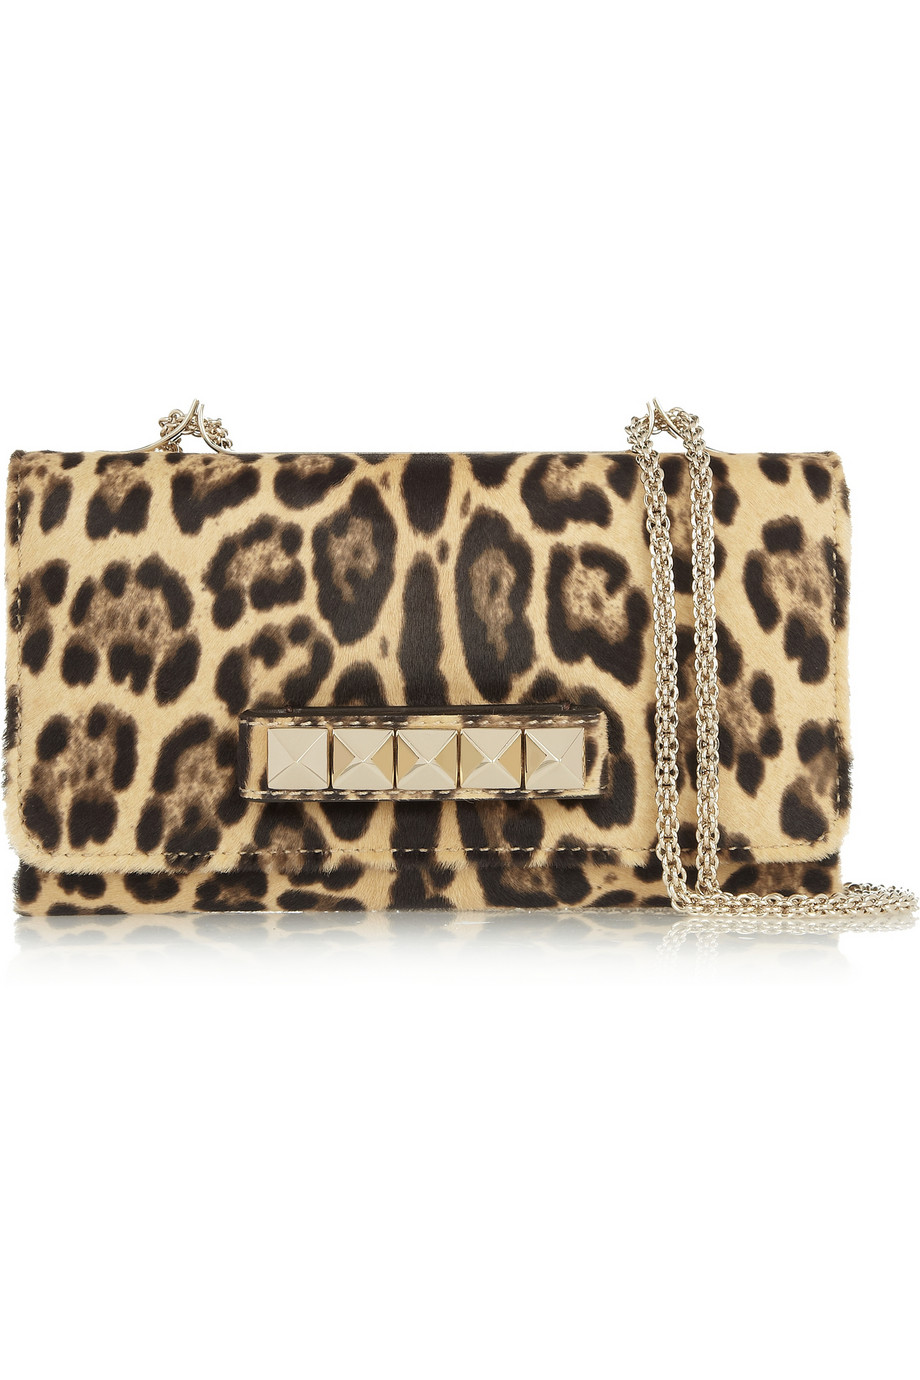 valentino va va voom calf hair shoulder bag in animal leopard print lyst. Black Bedroom Furniture Sets. Home Design Ideas